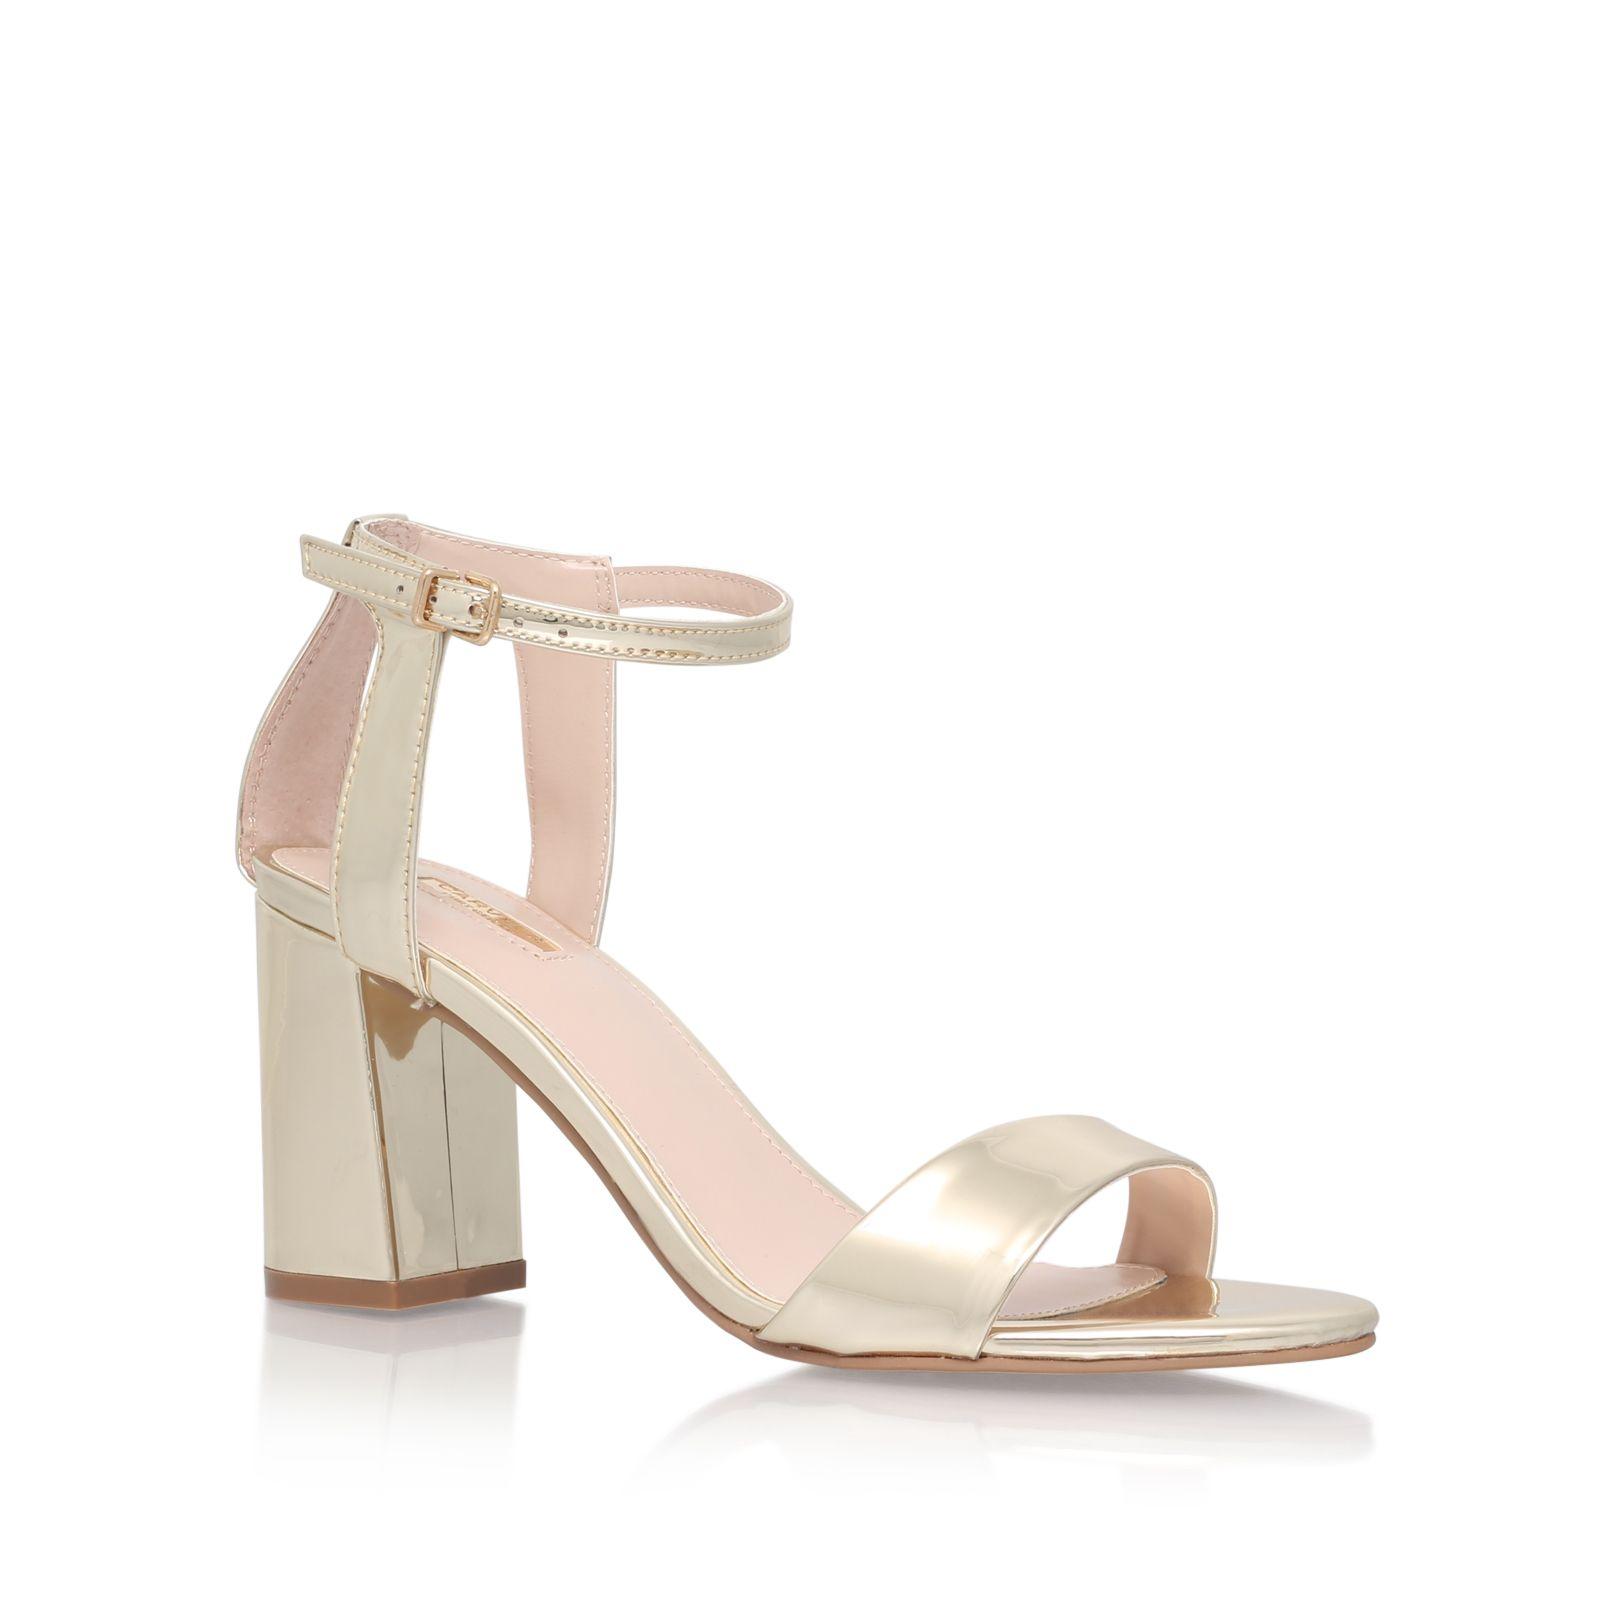 49579be06e64 Shop GIGI Gold Mid Heel Sandals by CARVELA at official Kurt Geiger Site.